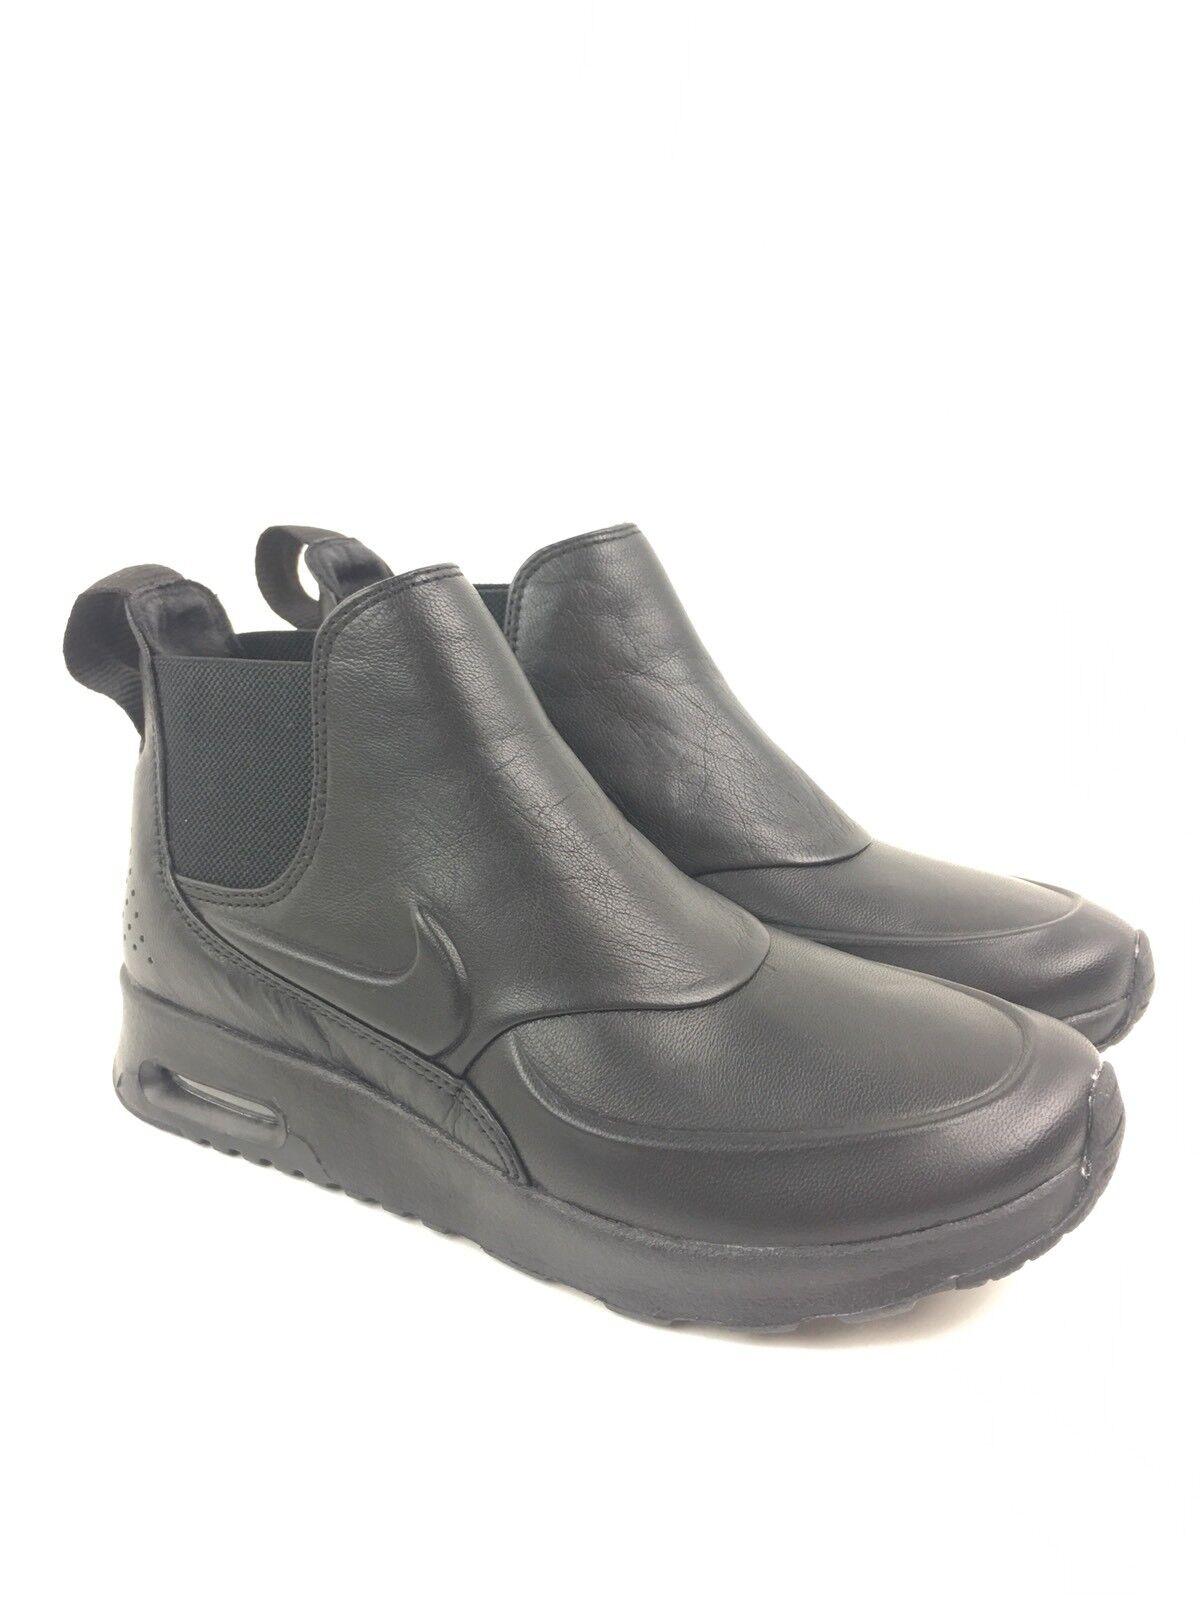 Nike Womens Air Max Thea Mid Pinnacle Shoes Size 5.5 Black 861659-001 Boots A162